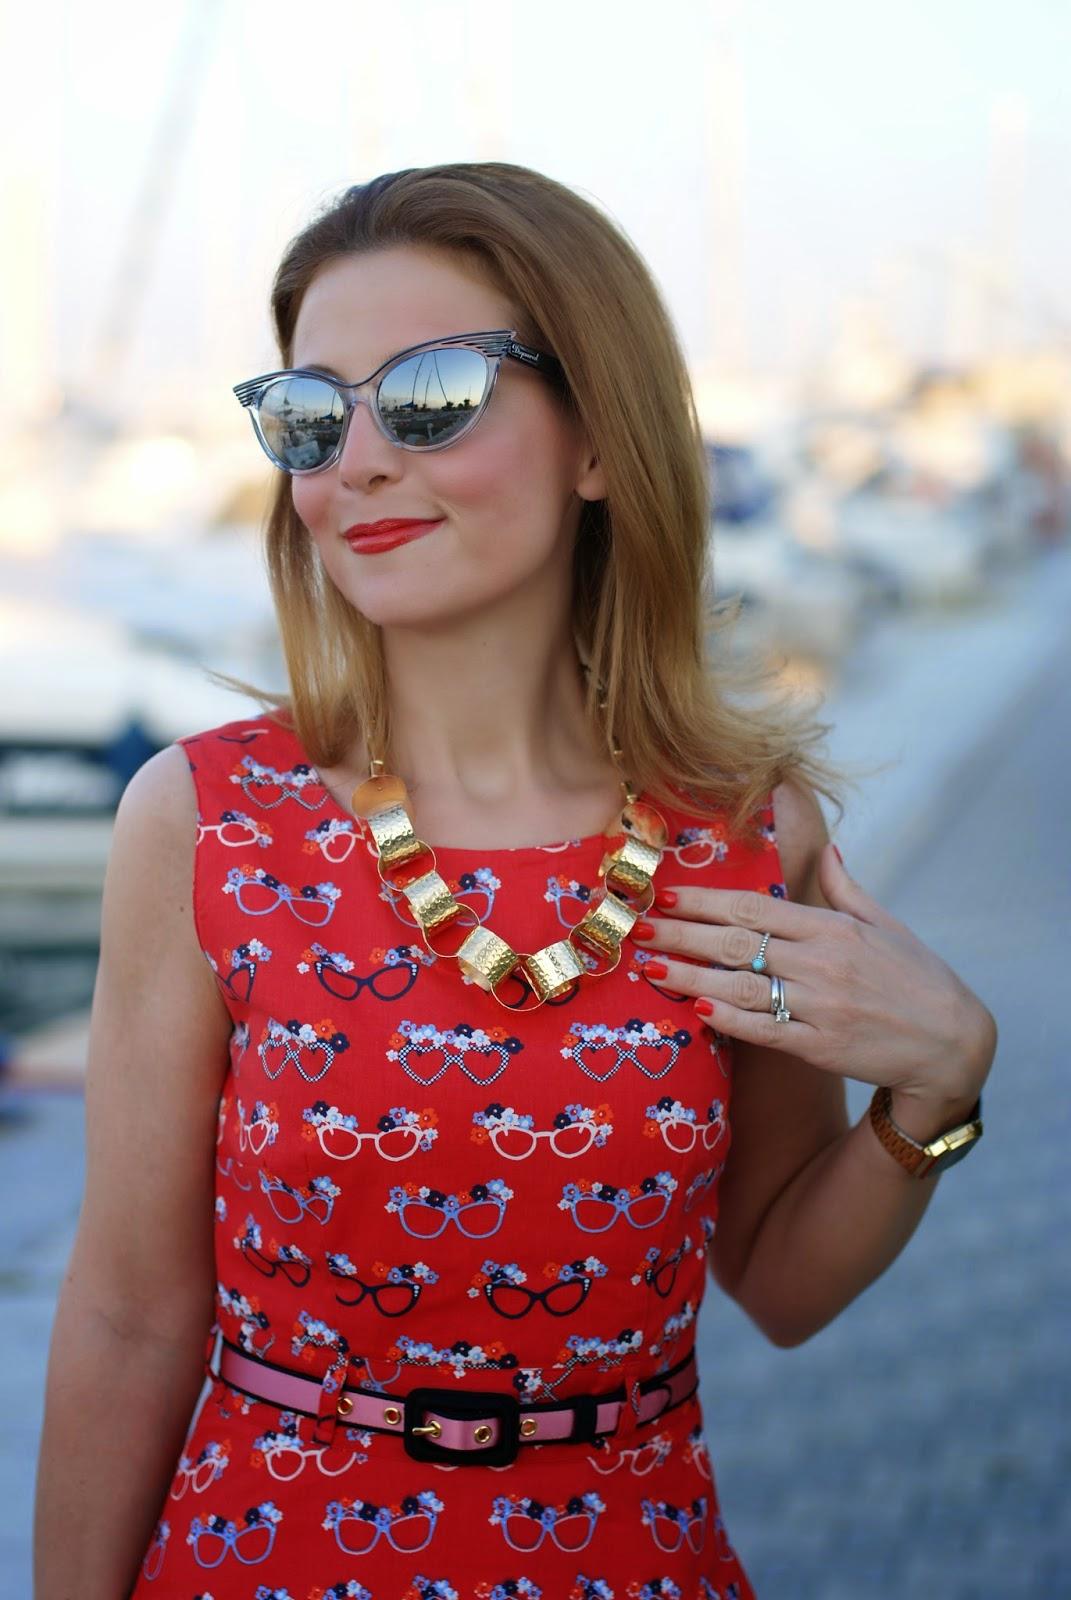 Dsquared2 cat eye mirror sunglasses, yumi glasses print dress, Vitti Ferria Contin necklace, Fashion and Cookies, fashion blogger